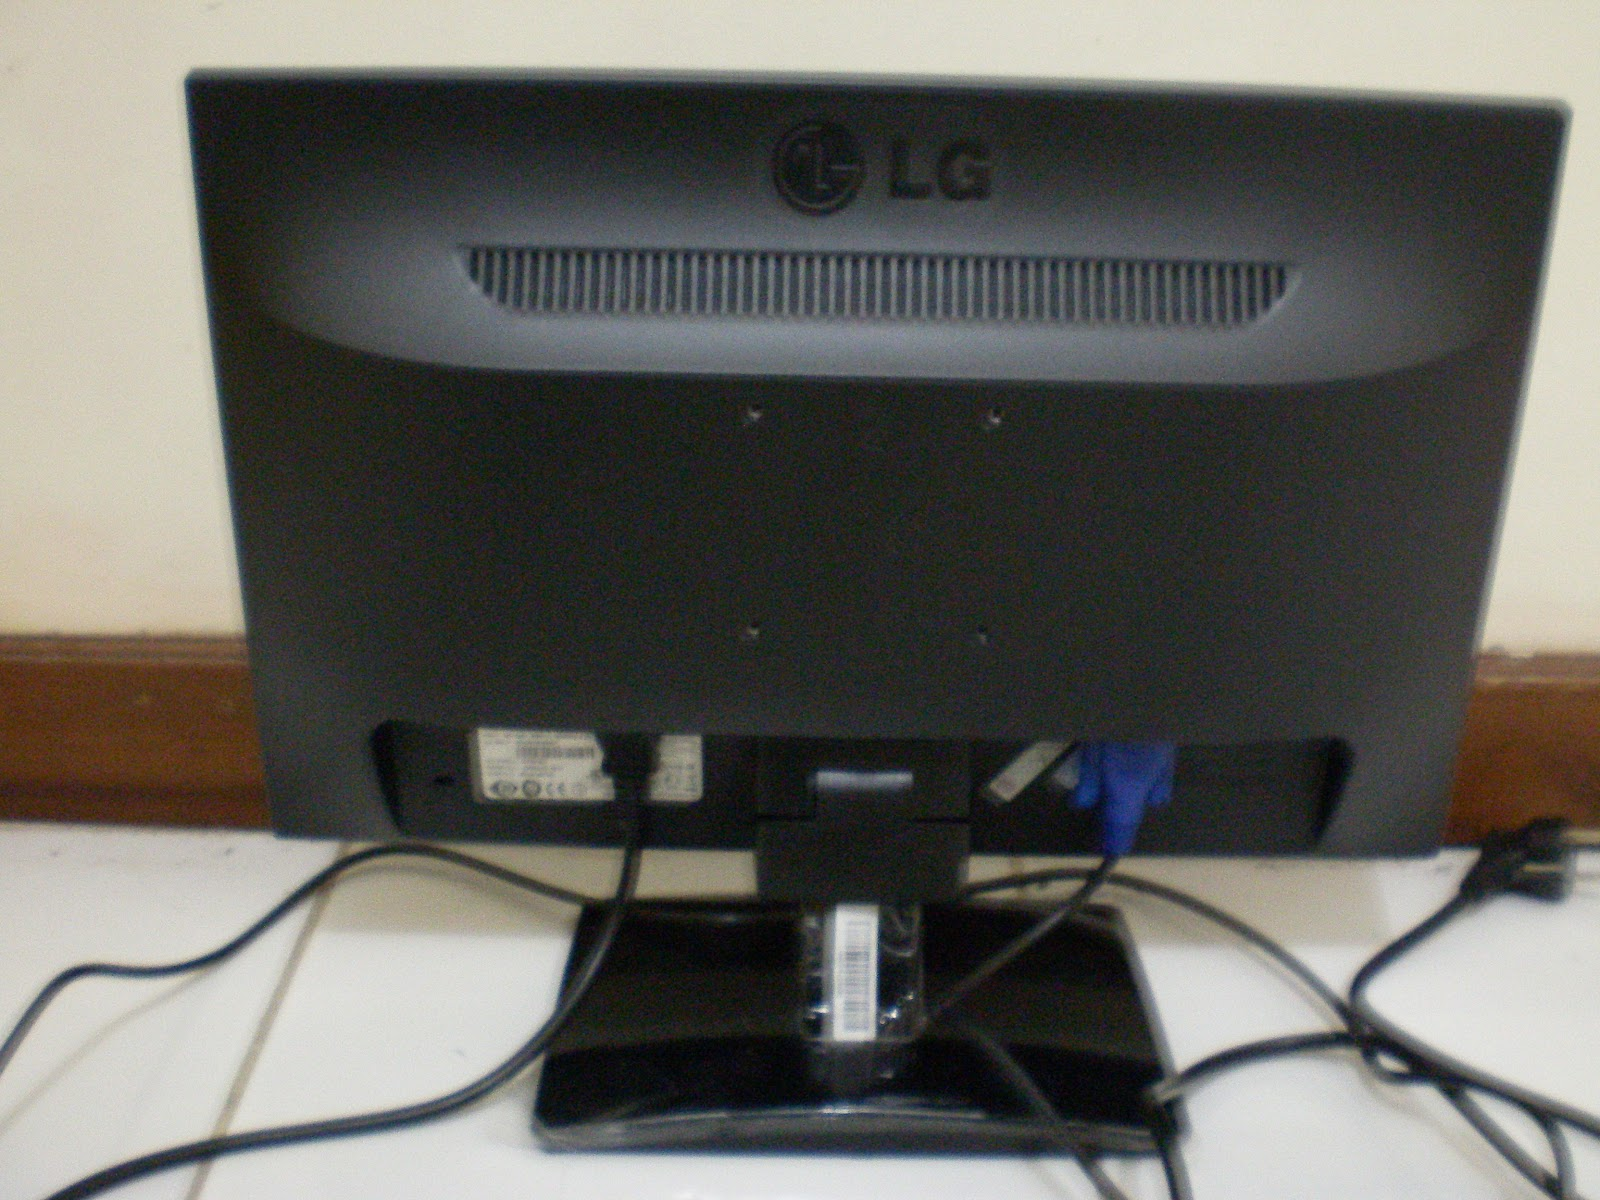 Shadow Company Monitor LCD LG Flatron E1941 Tv Lcd